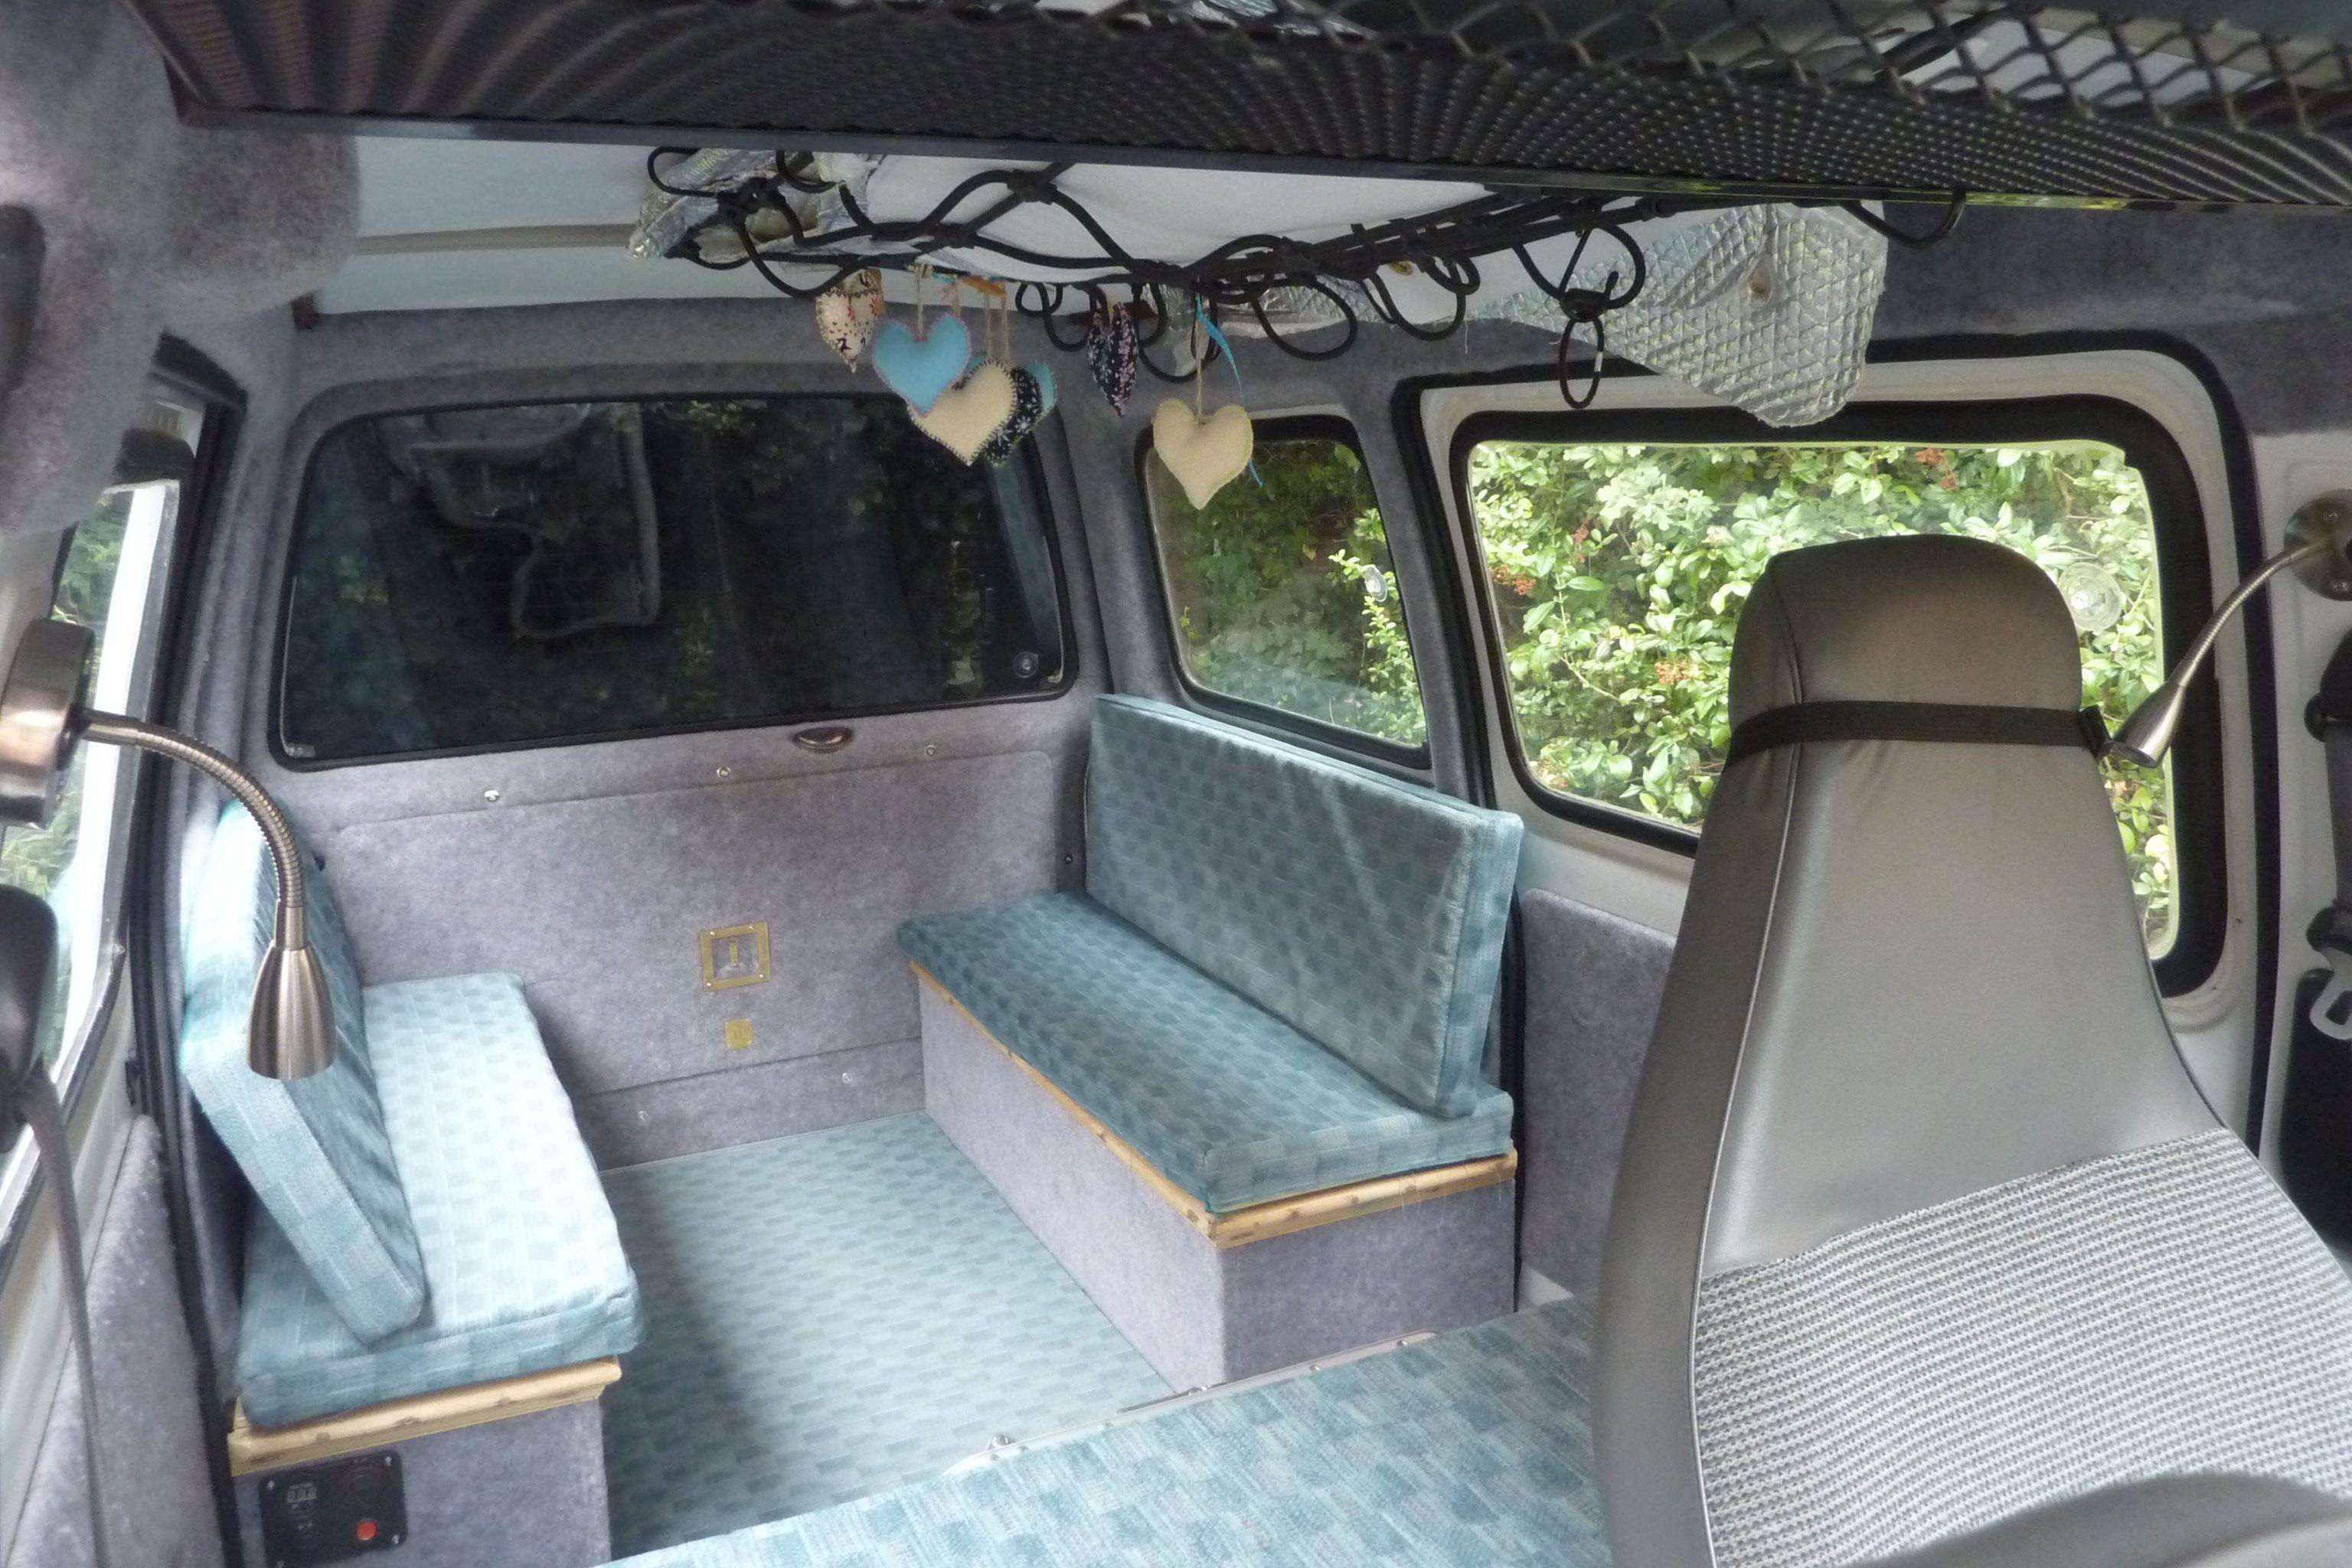 Suzuki Super Carry Camper Van Conversion From A 9 Seater Minibus For Children The Floor Is In Two Section Camper Van Conversion Van Conversion Sliding Doors